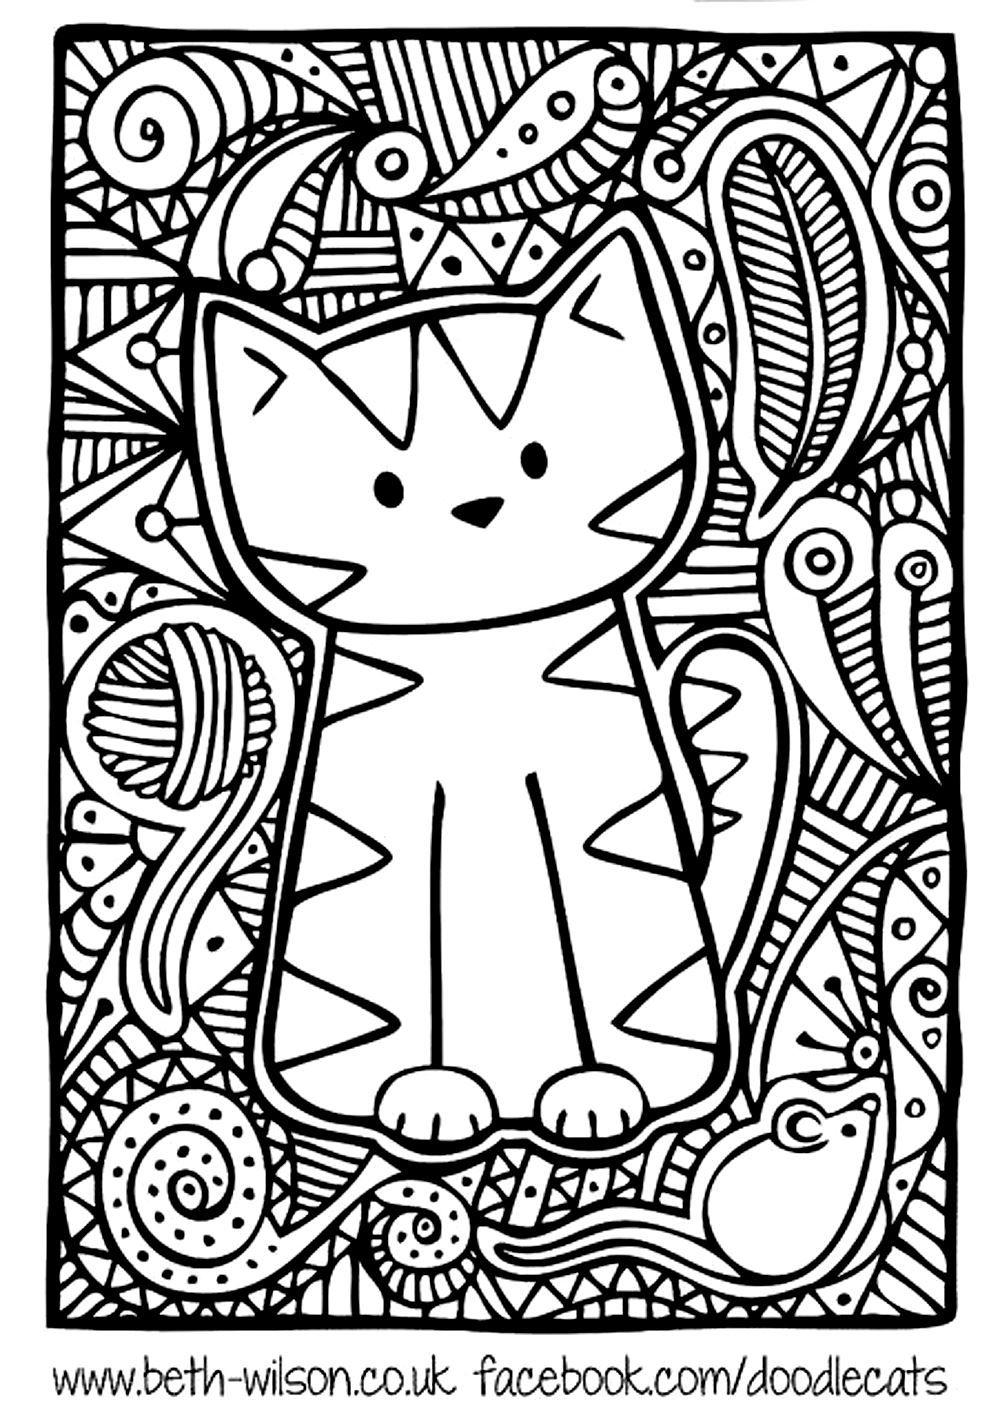 Master Pieces - Coloring Pages For Adults : Coloring à Dessin De Chat Simple